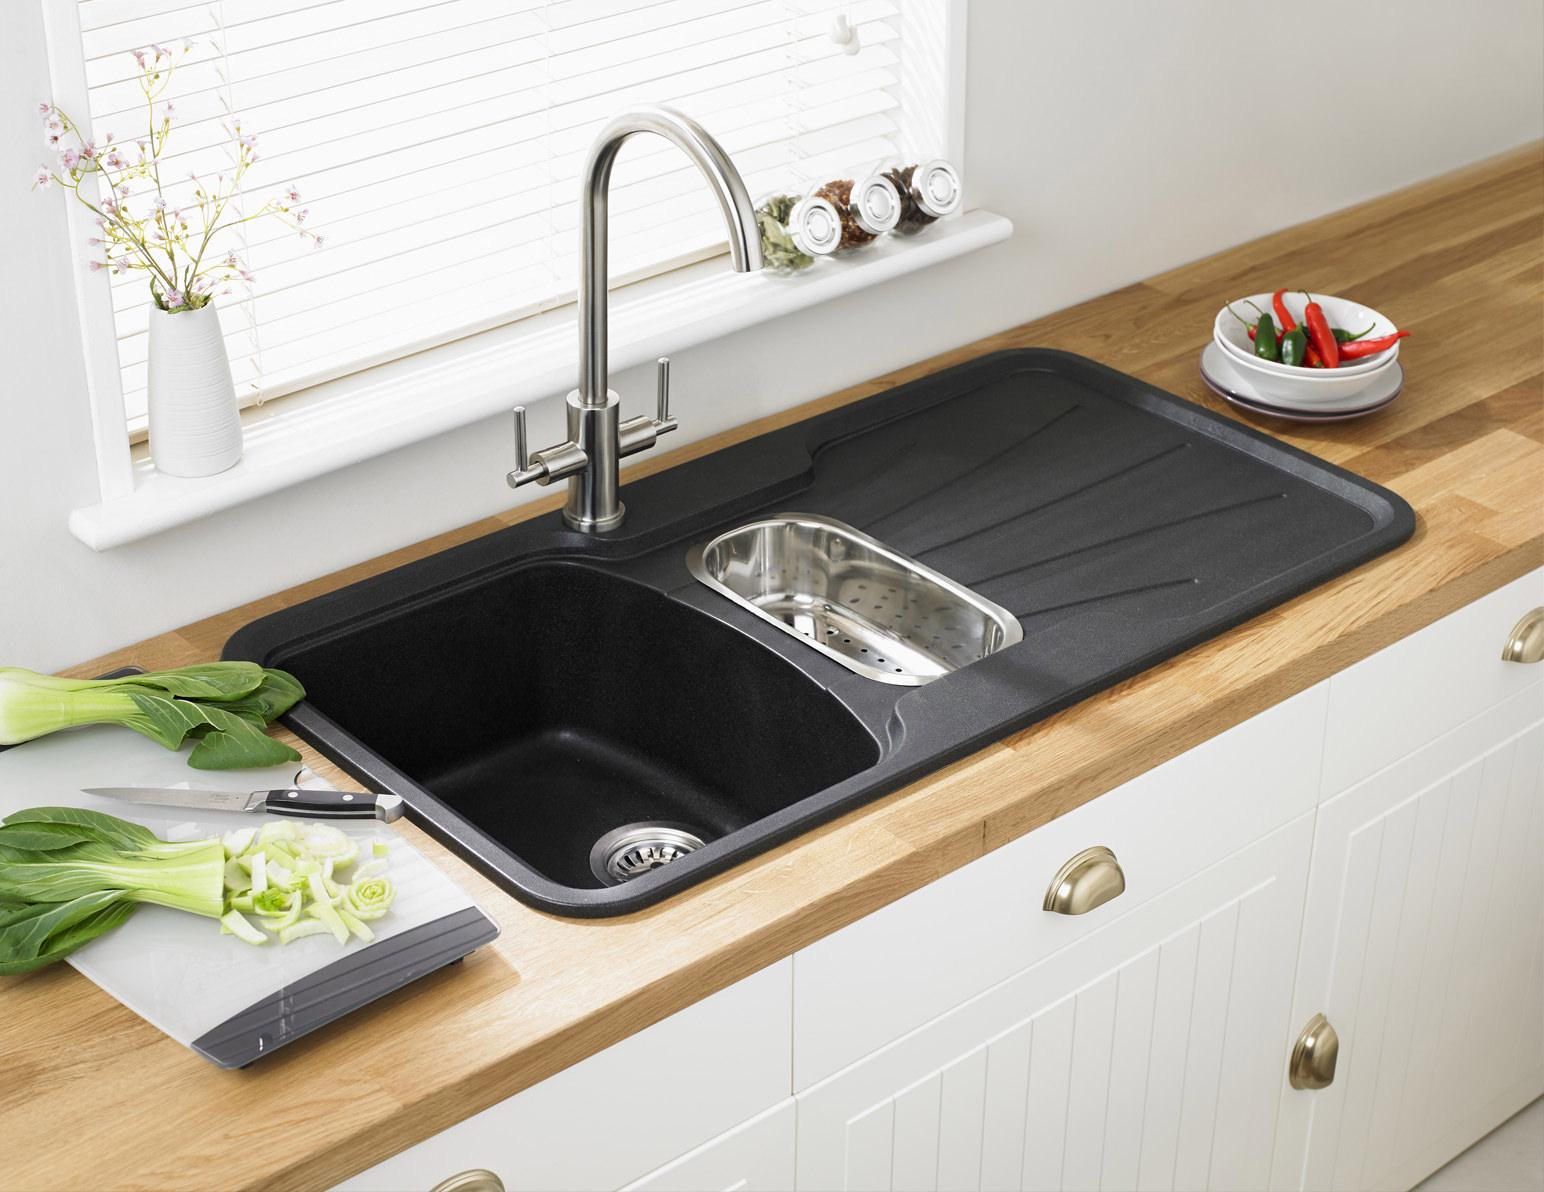 Astracast Korona 1 5b Composite Rok Metallic Inset Sink